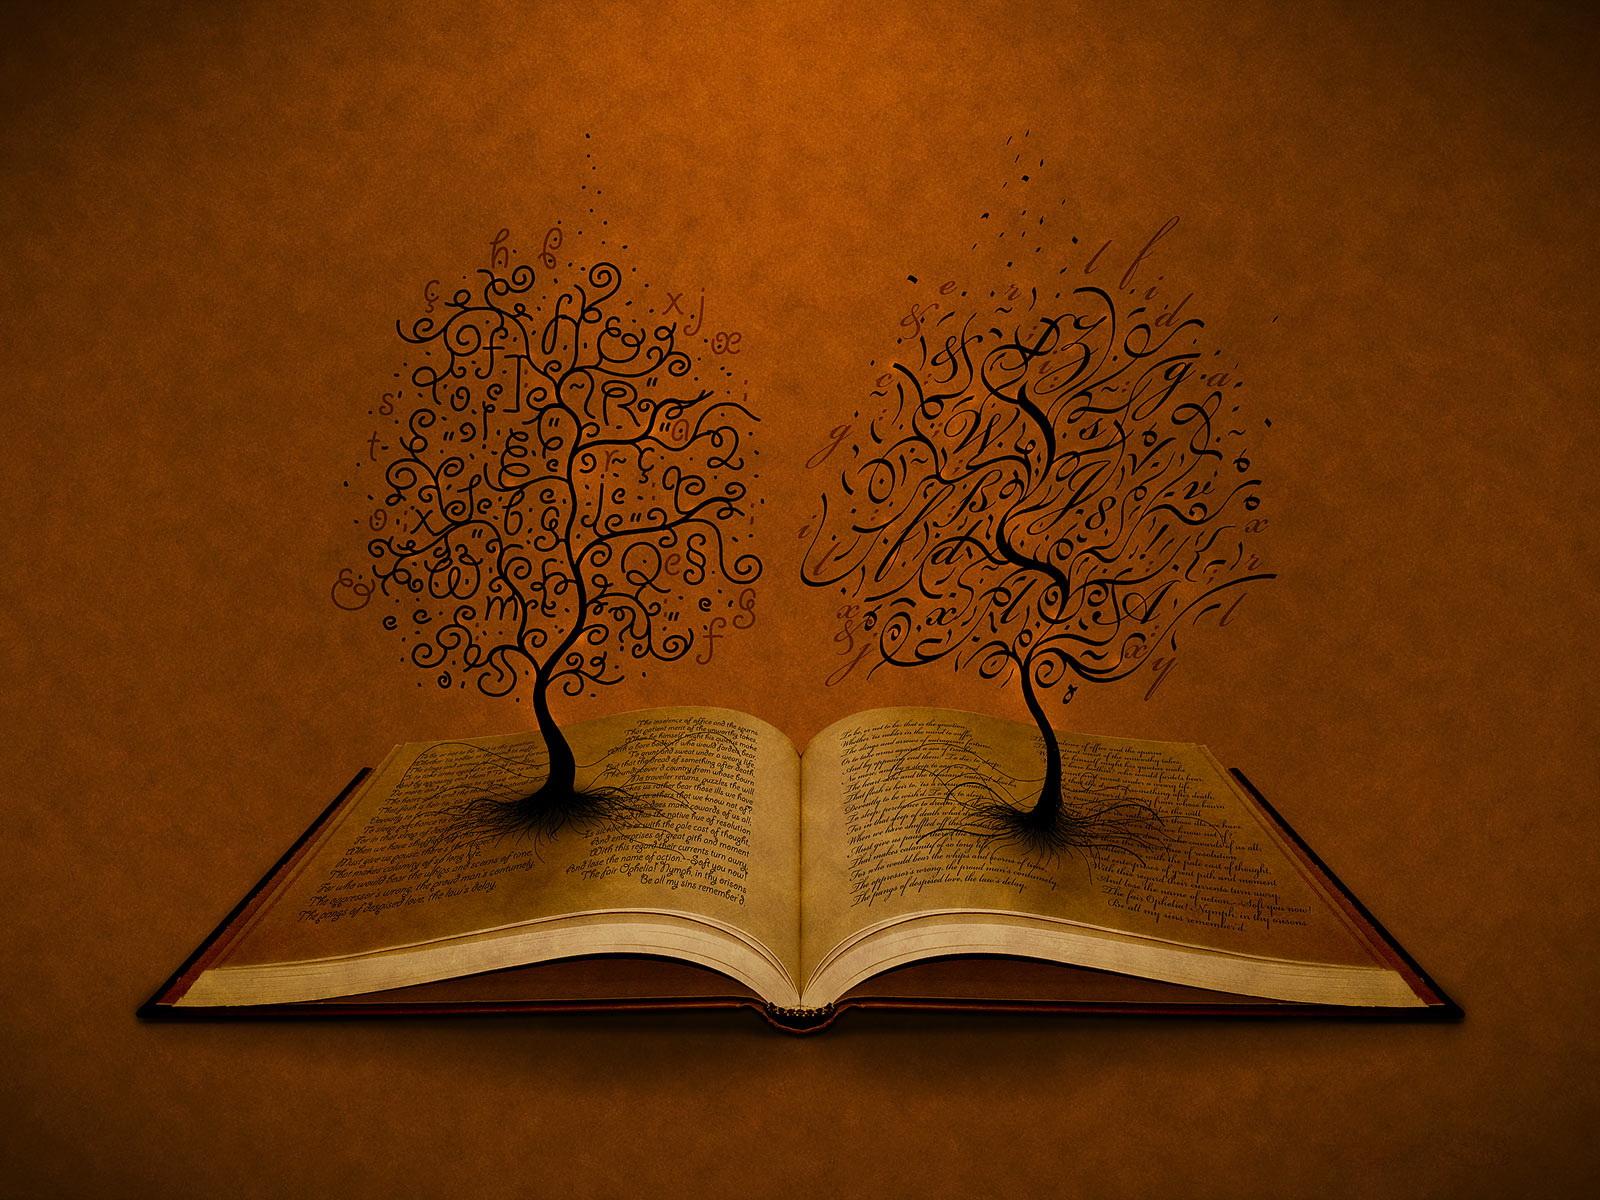 Cool Book Wallpaper 22146 1600x1200 px